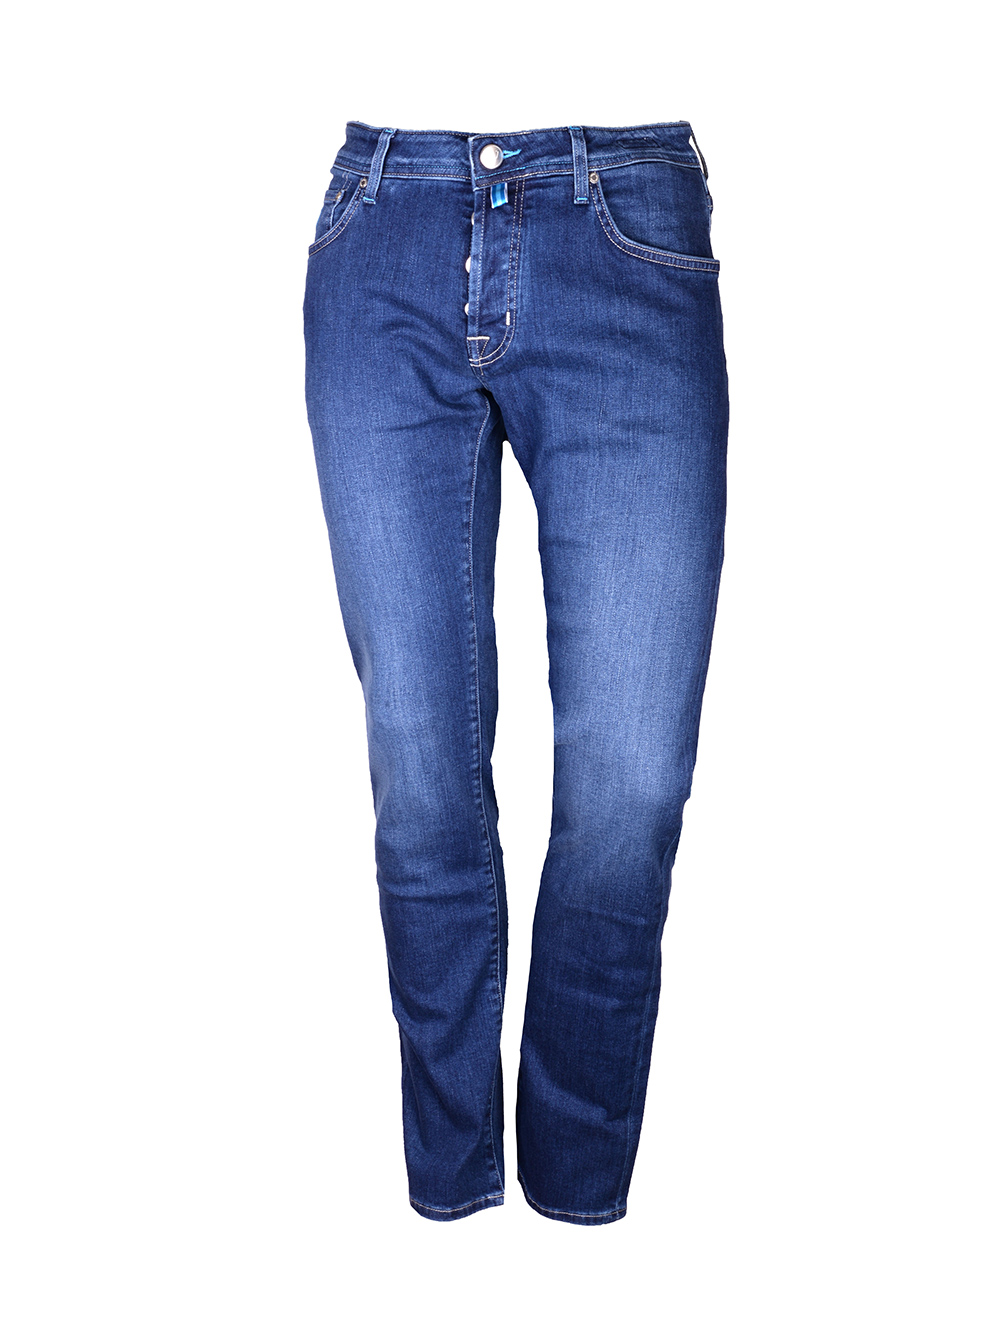 JACOB COHEN Παντελόνι Jeans J622 COMF00918W1 ΤΖΙΝ